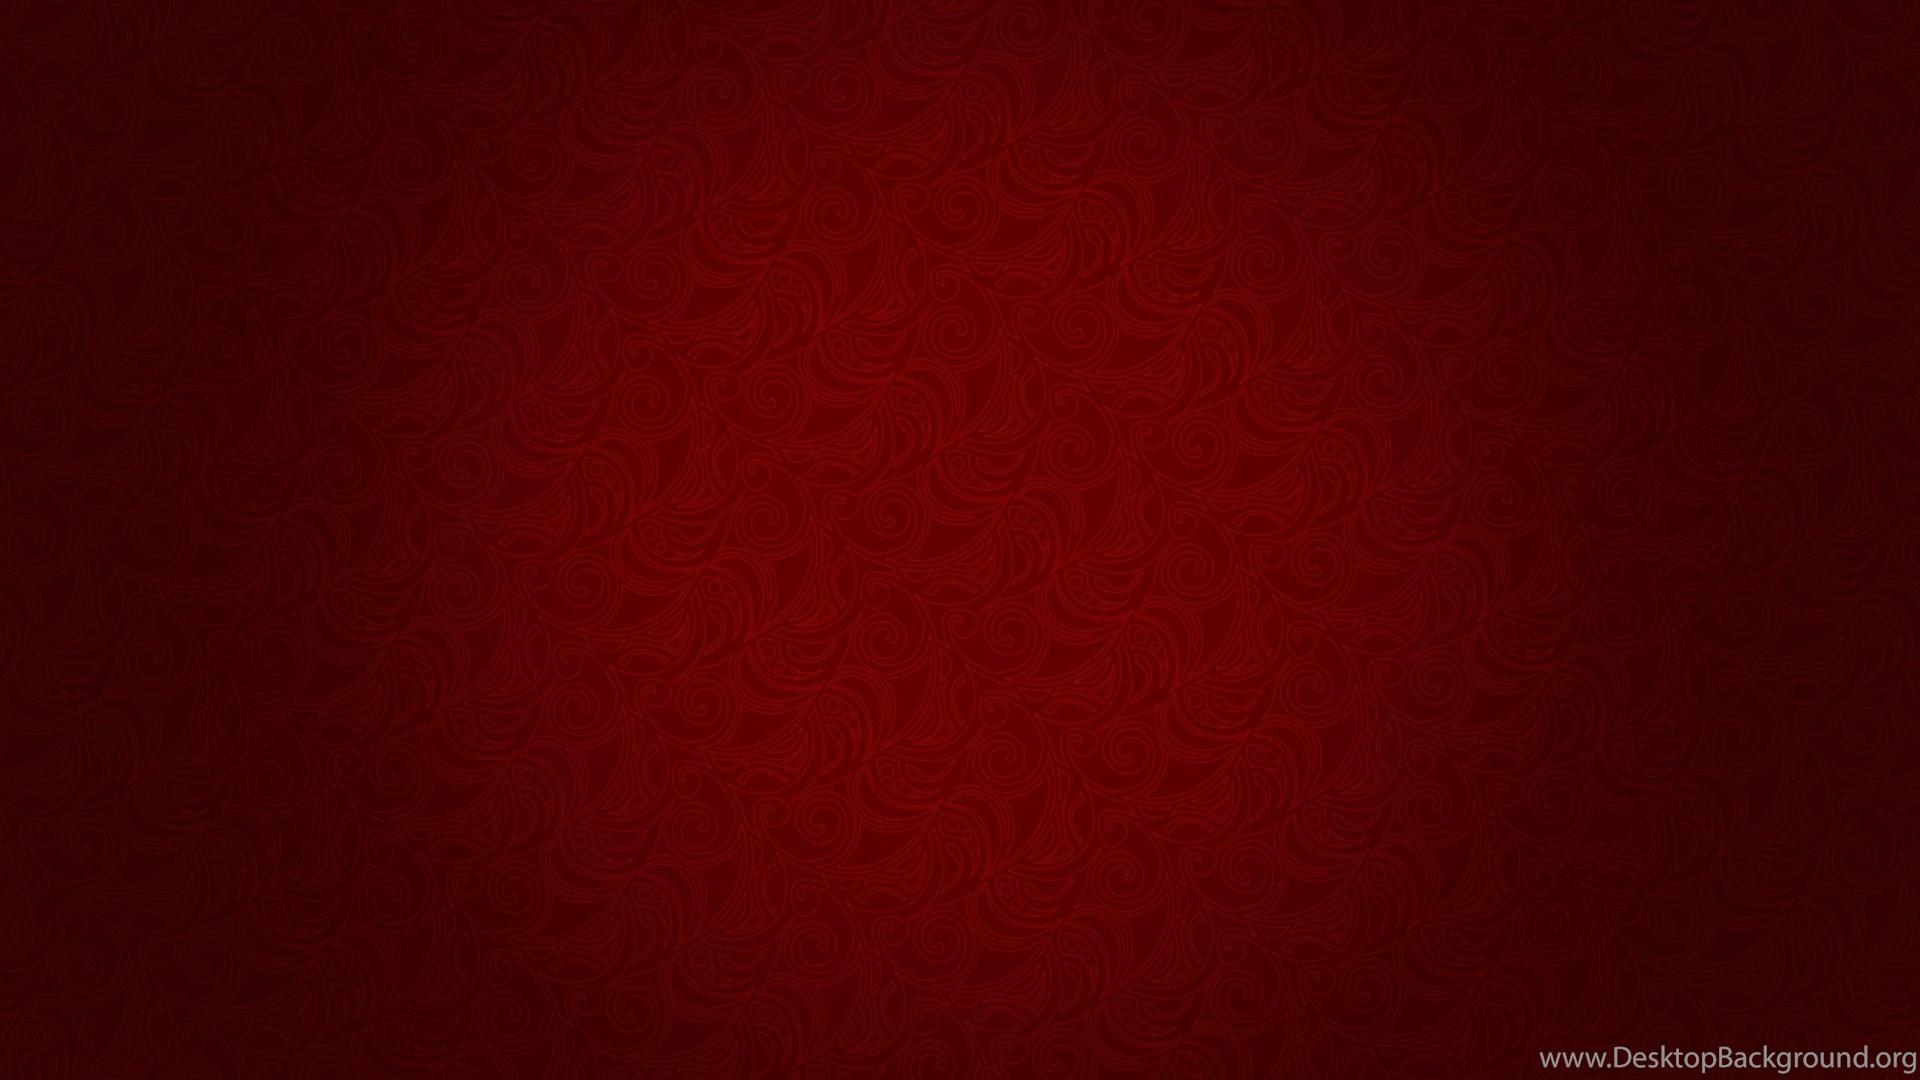 Red Swirl Texture Wallpaper.jpg Desktop Background